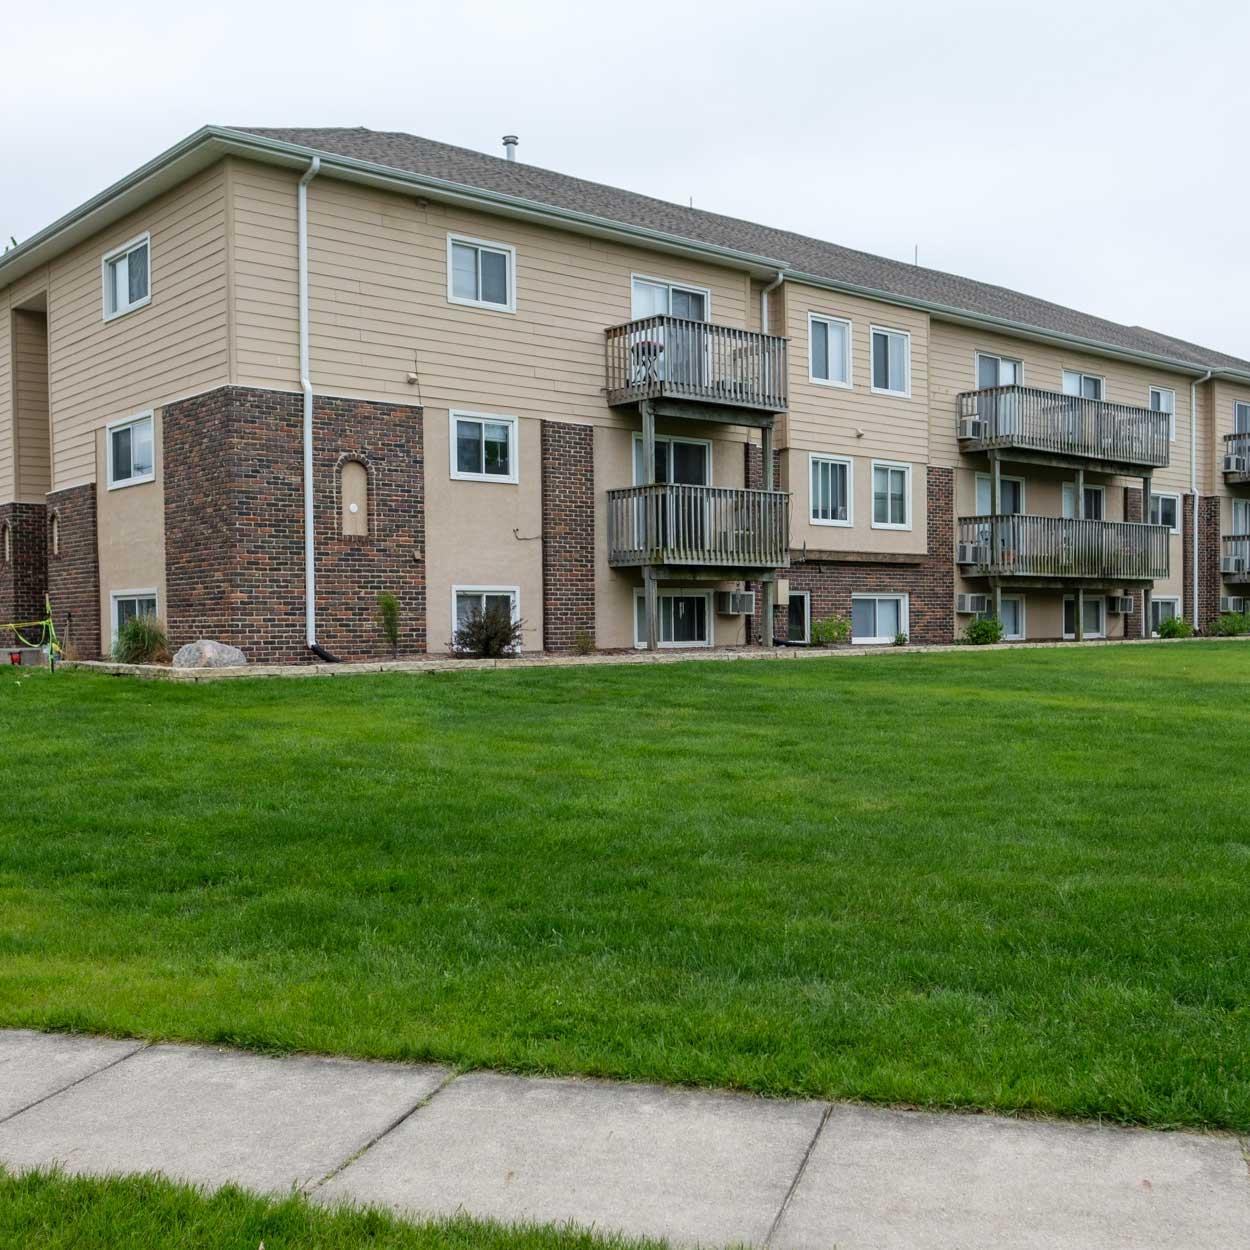 Apartments At Iowa: Central Iowa Apartments